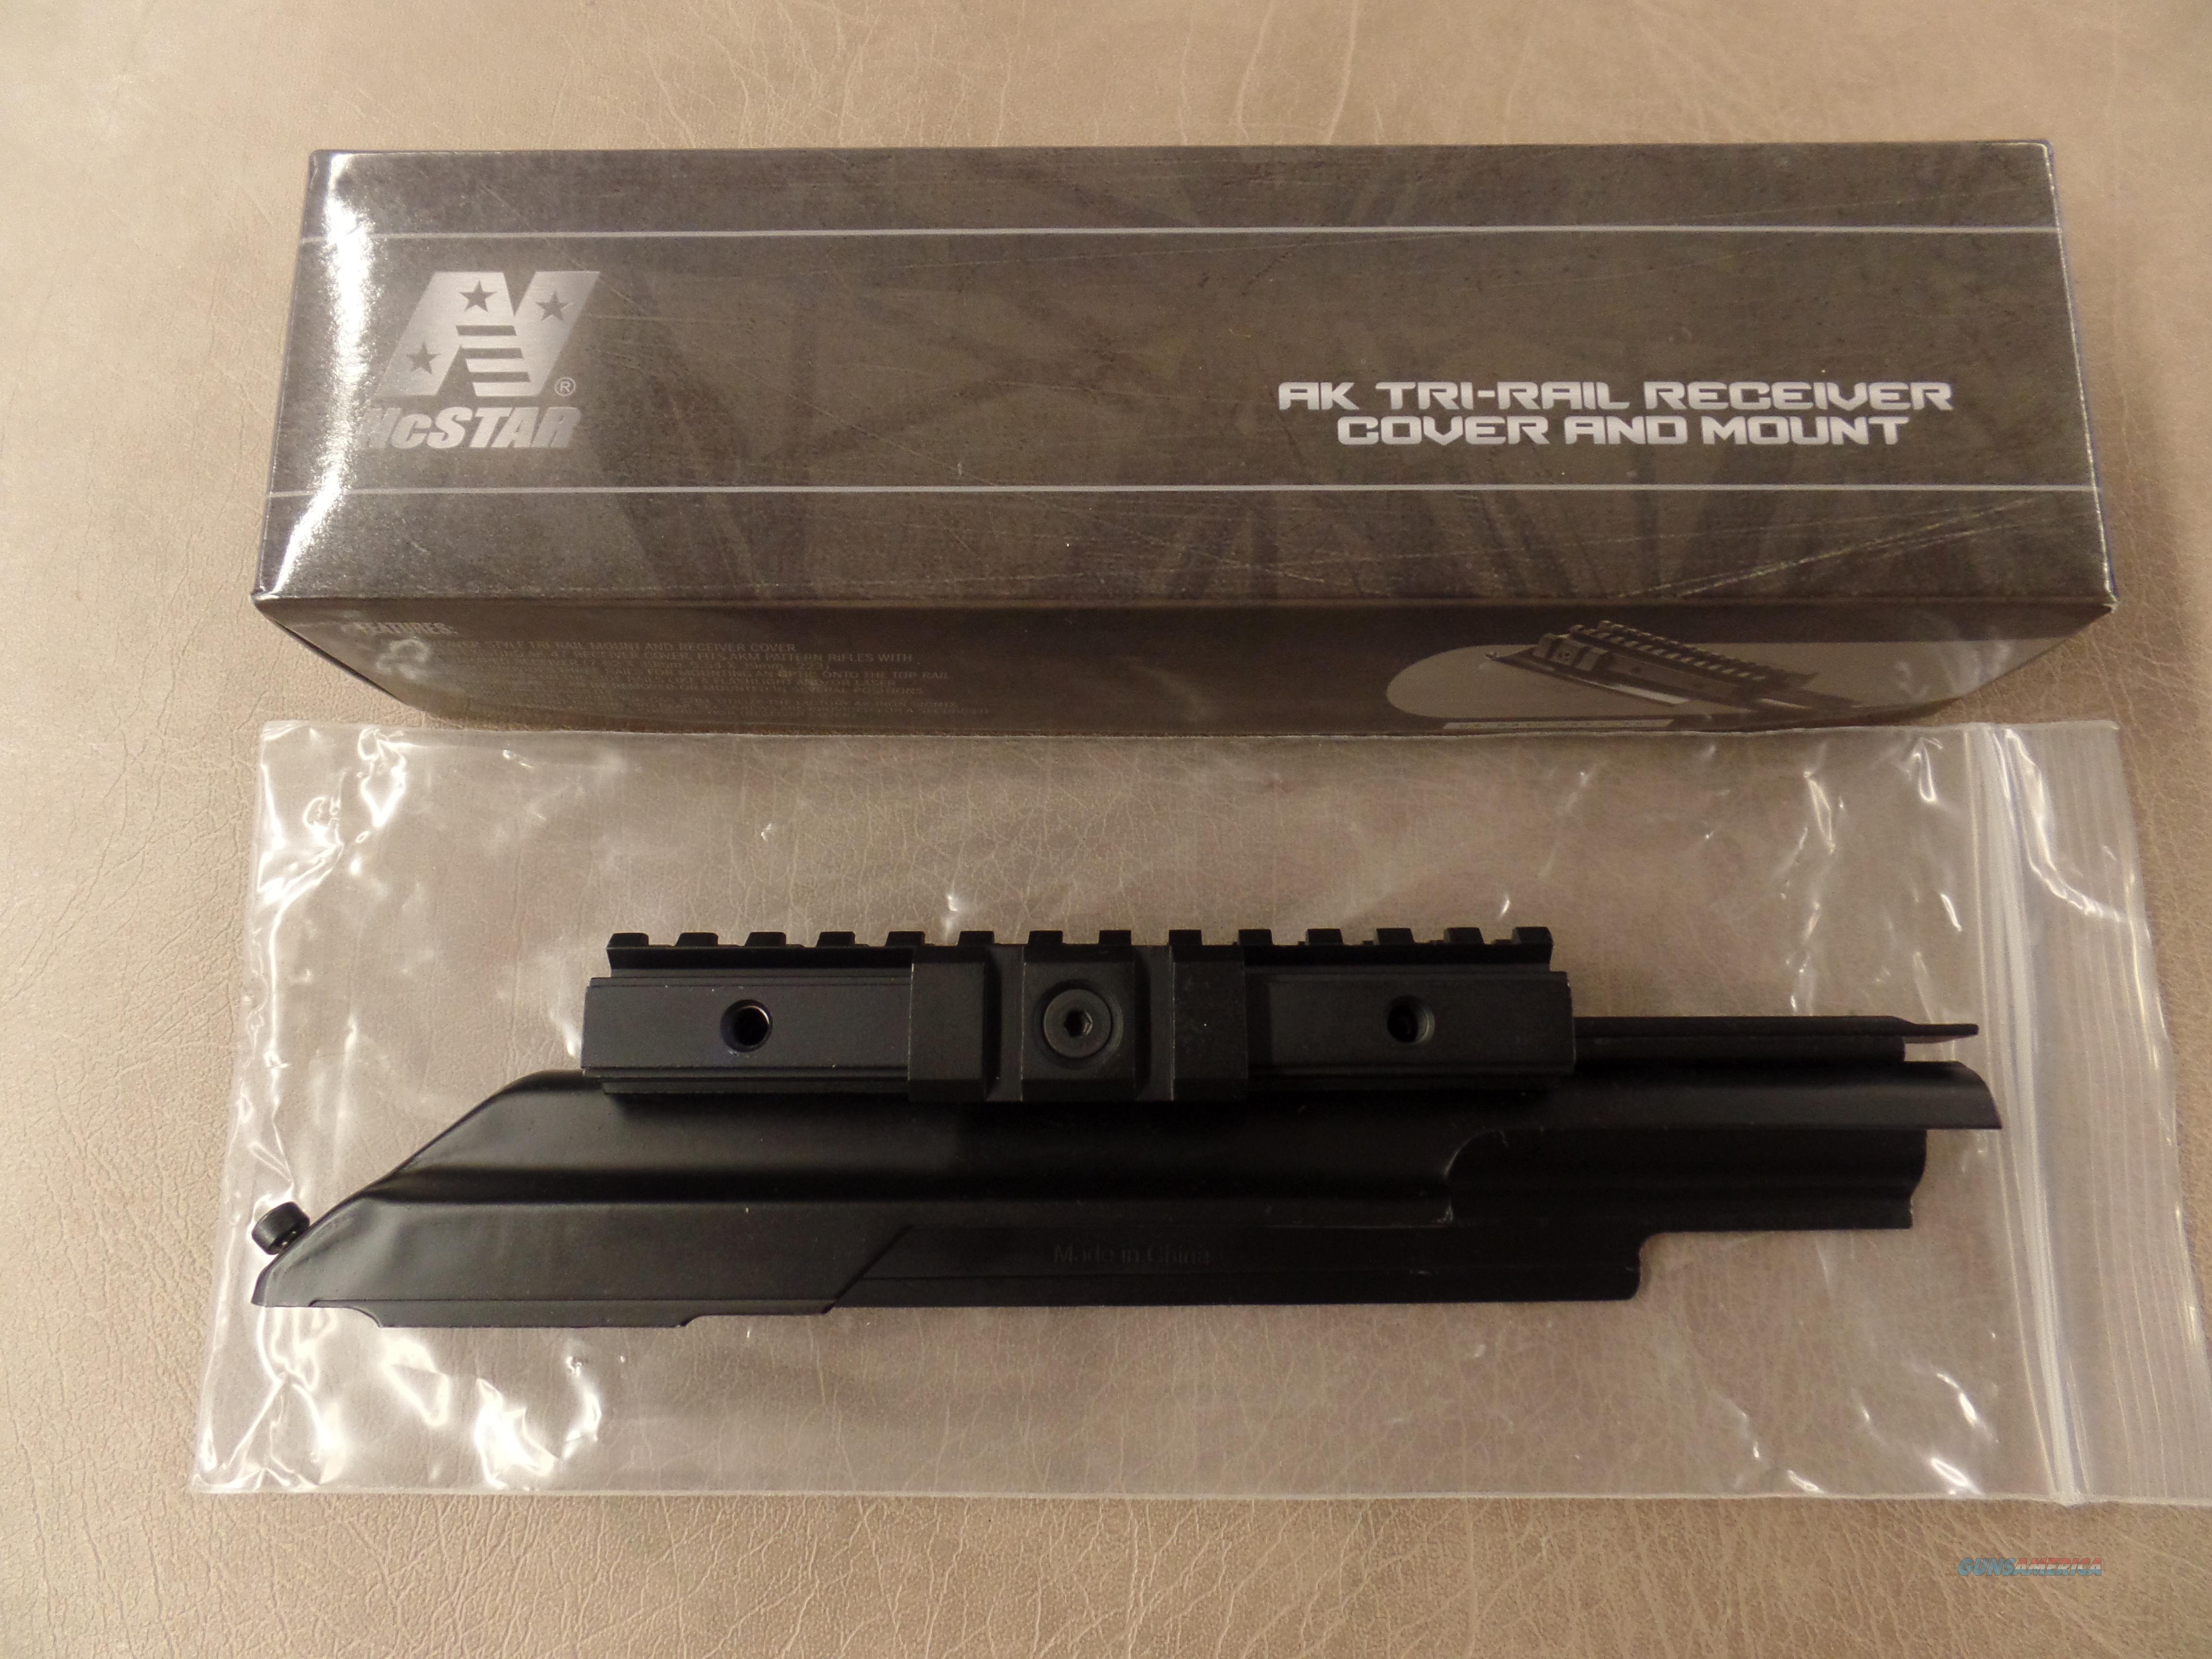 NcStar AK Tri-Rail Receiver Cover And Mount Model # MTAK  Non-Guns > Scopes/Mounts/Rings & Optics > Mounts > Tactical Rail Mounted